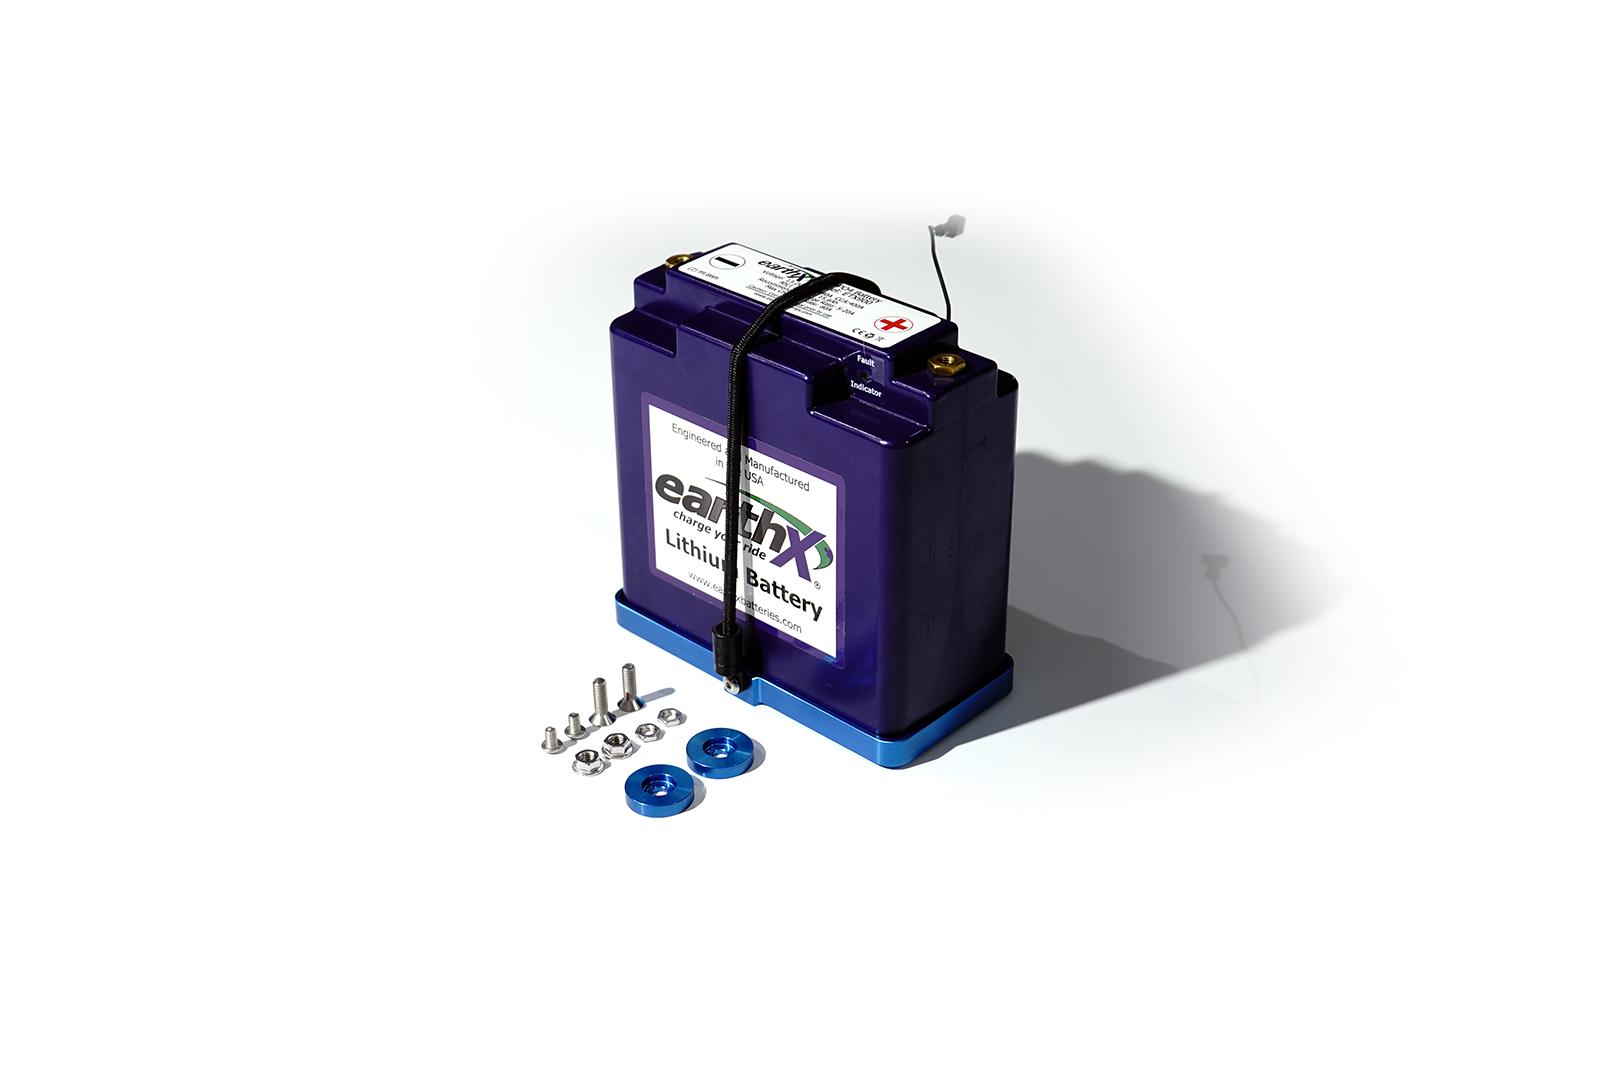 Lithium Battery Installation